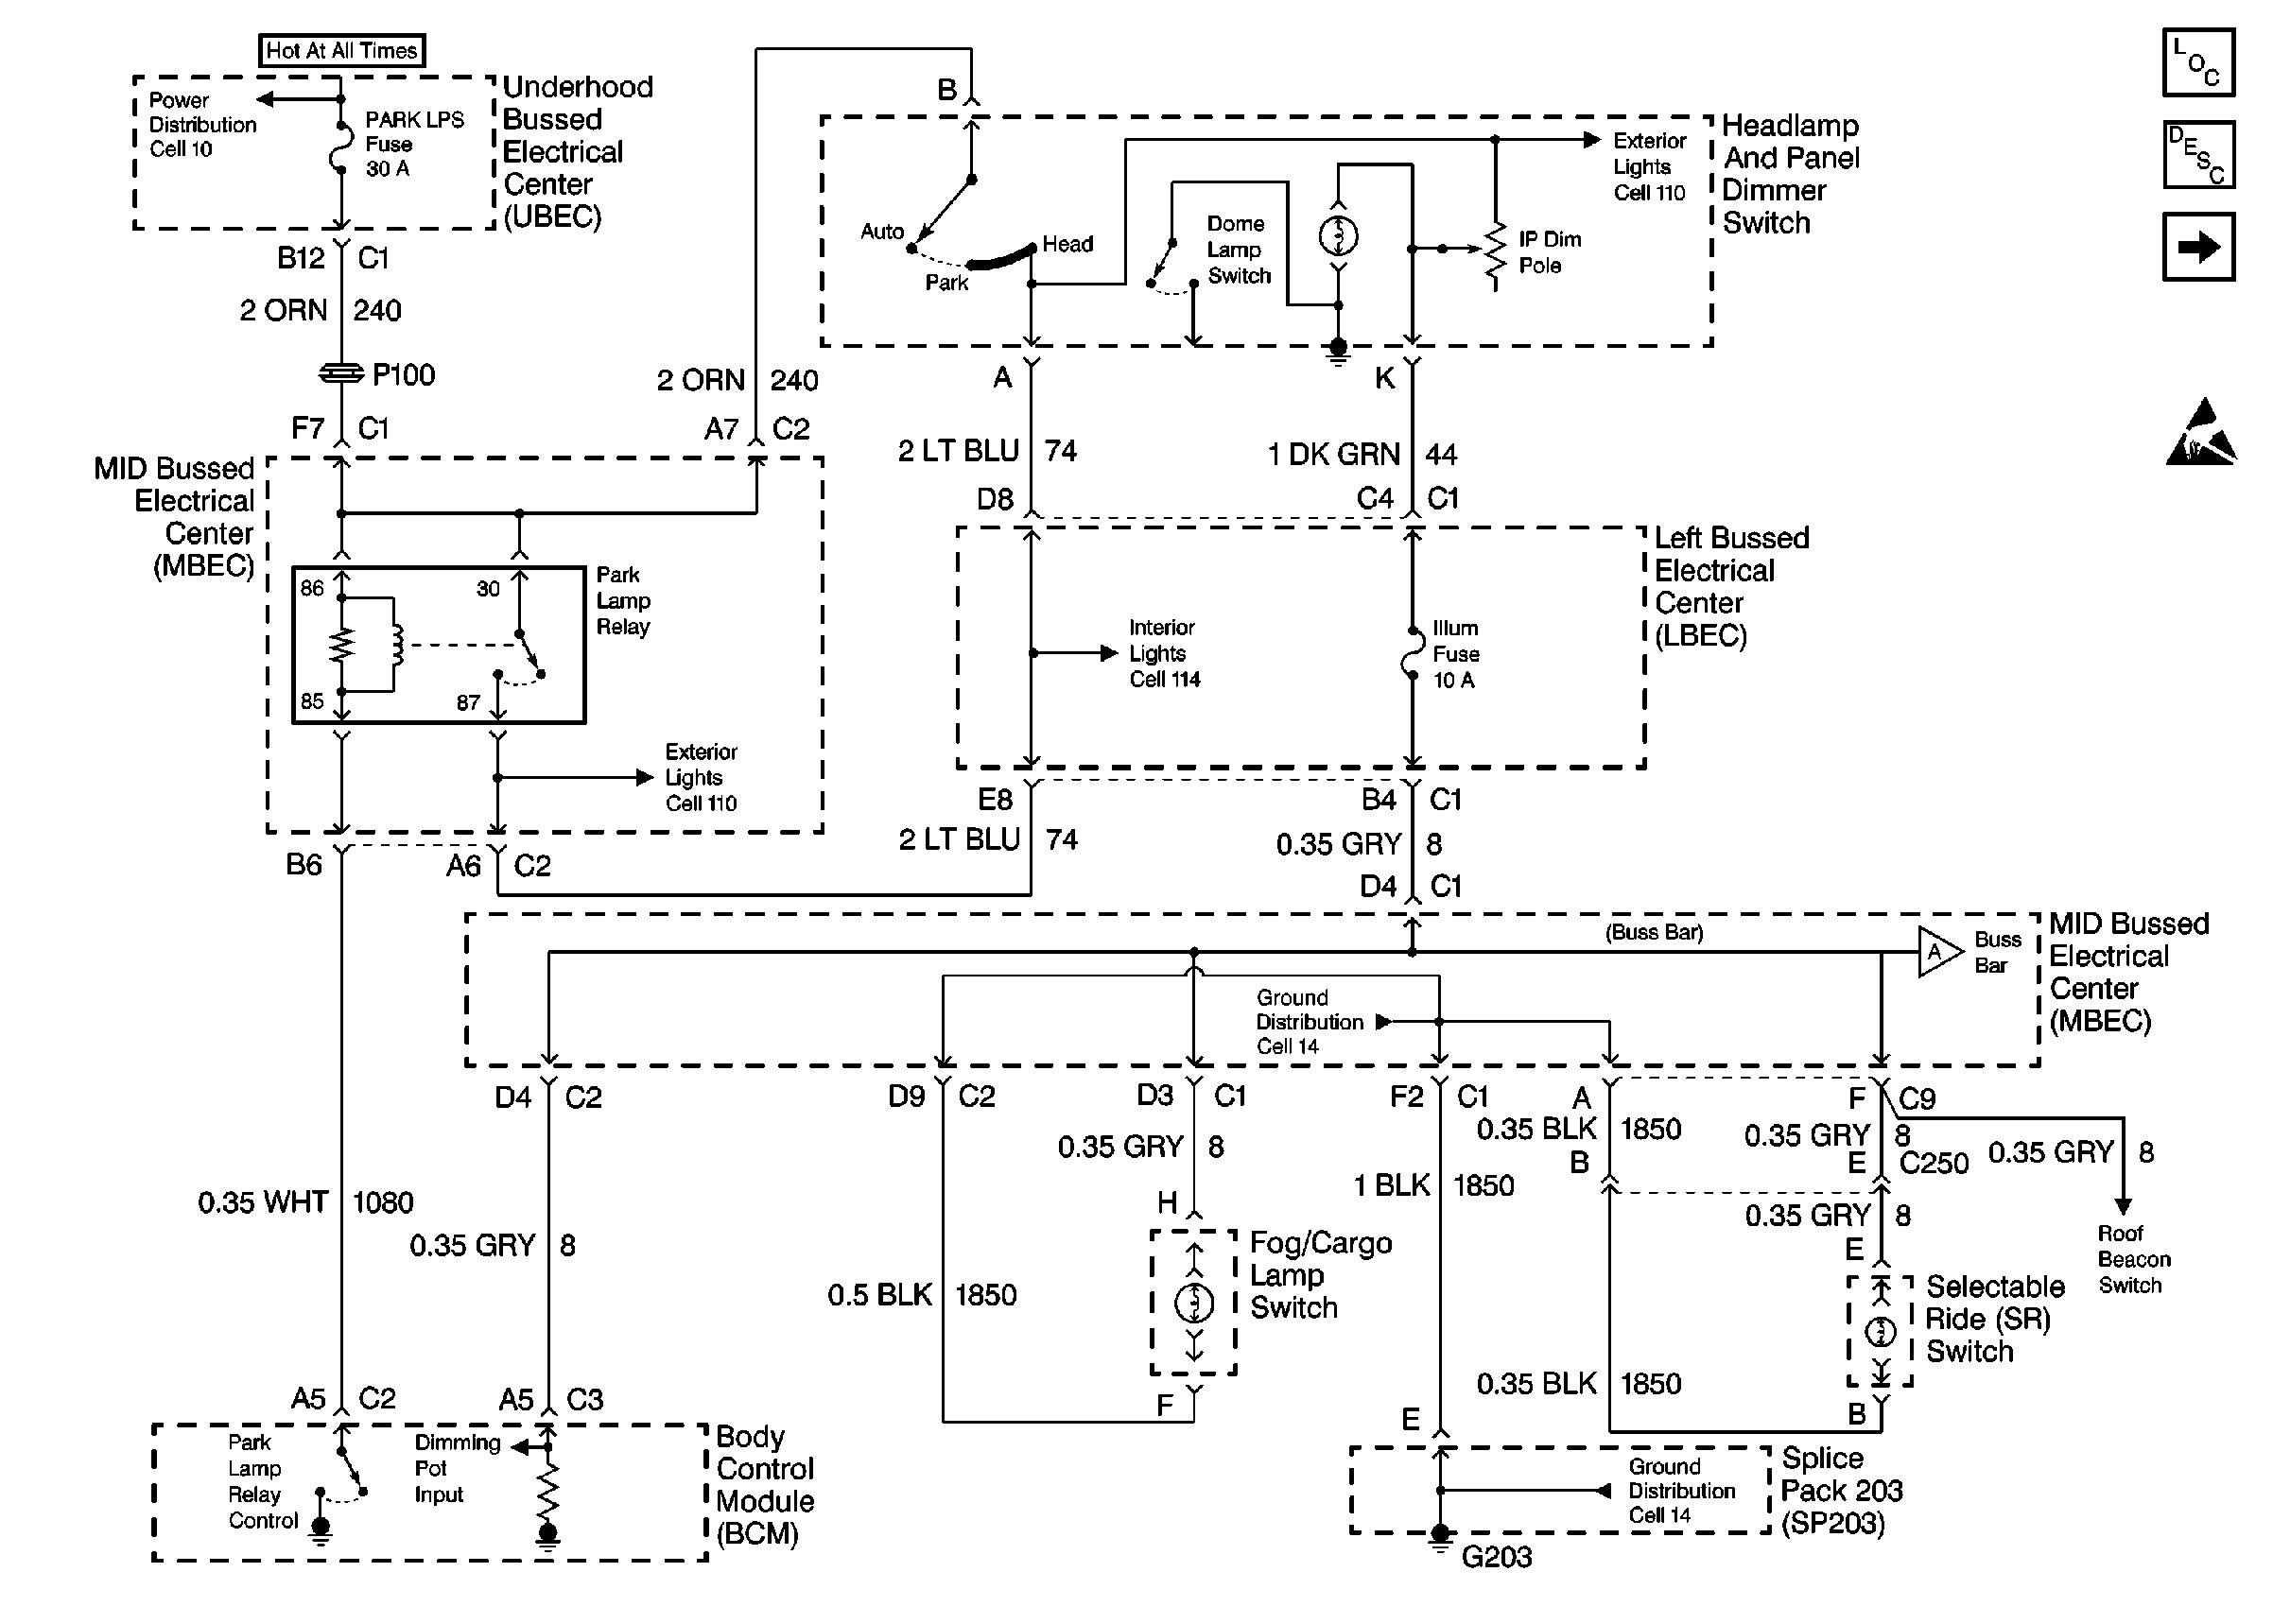 2003 Chevy Tahoe Radio Wiring Diagram Diagram 2008 Impala Headlight Wiring Diagram Chevy Equinox 2007 Pnp Wiring Diagram